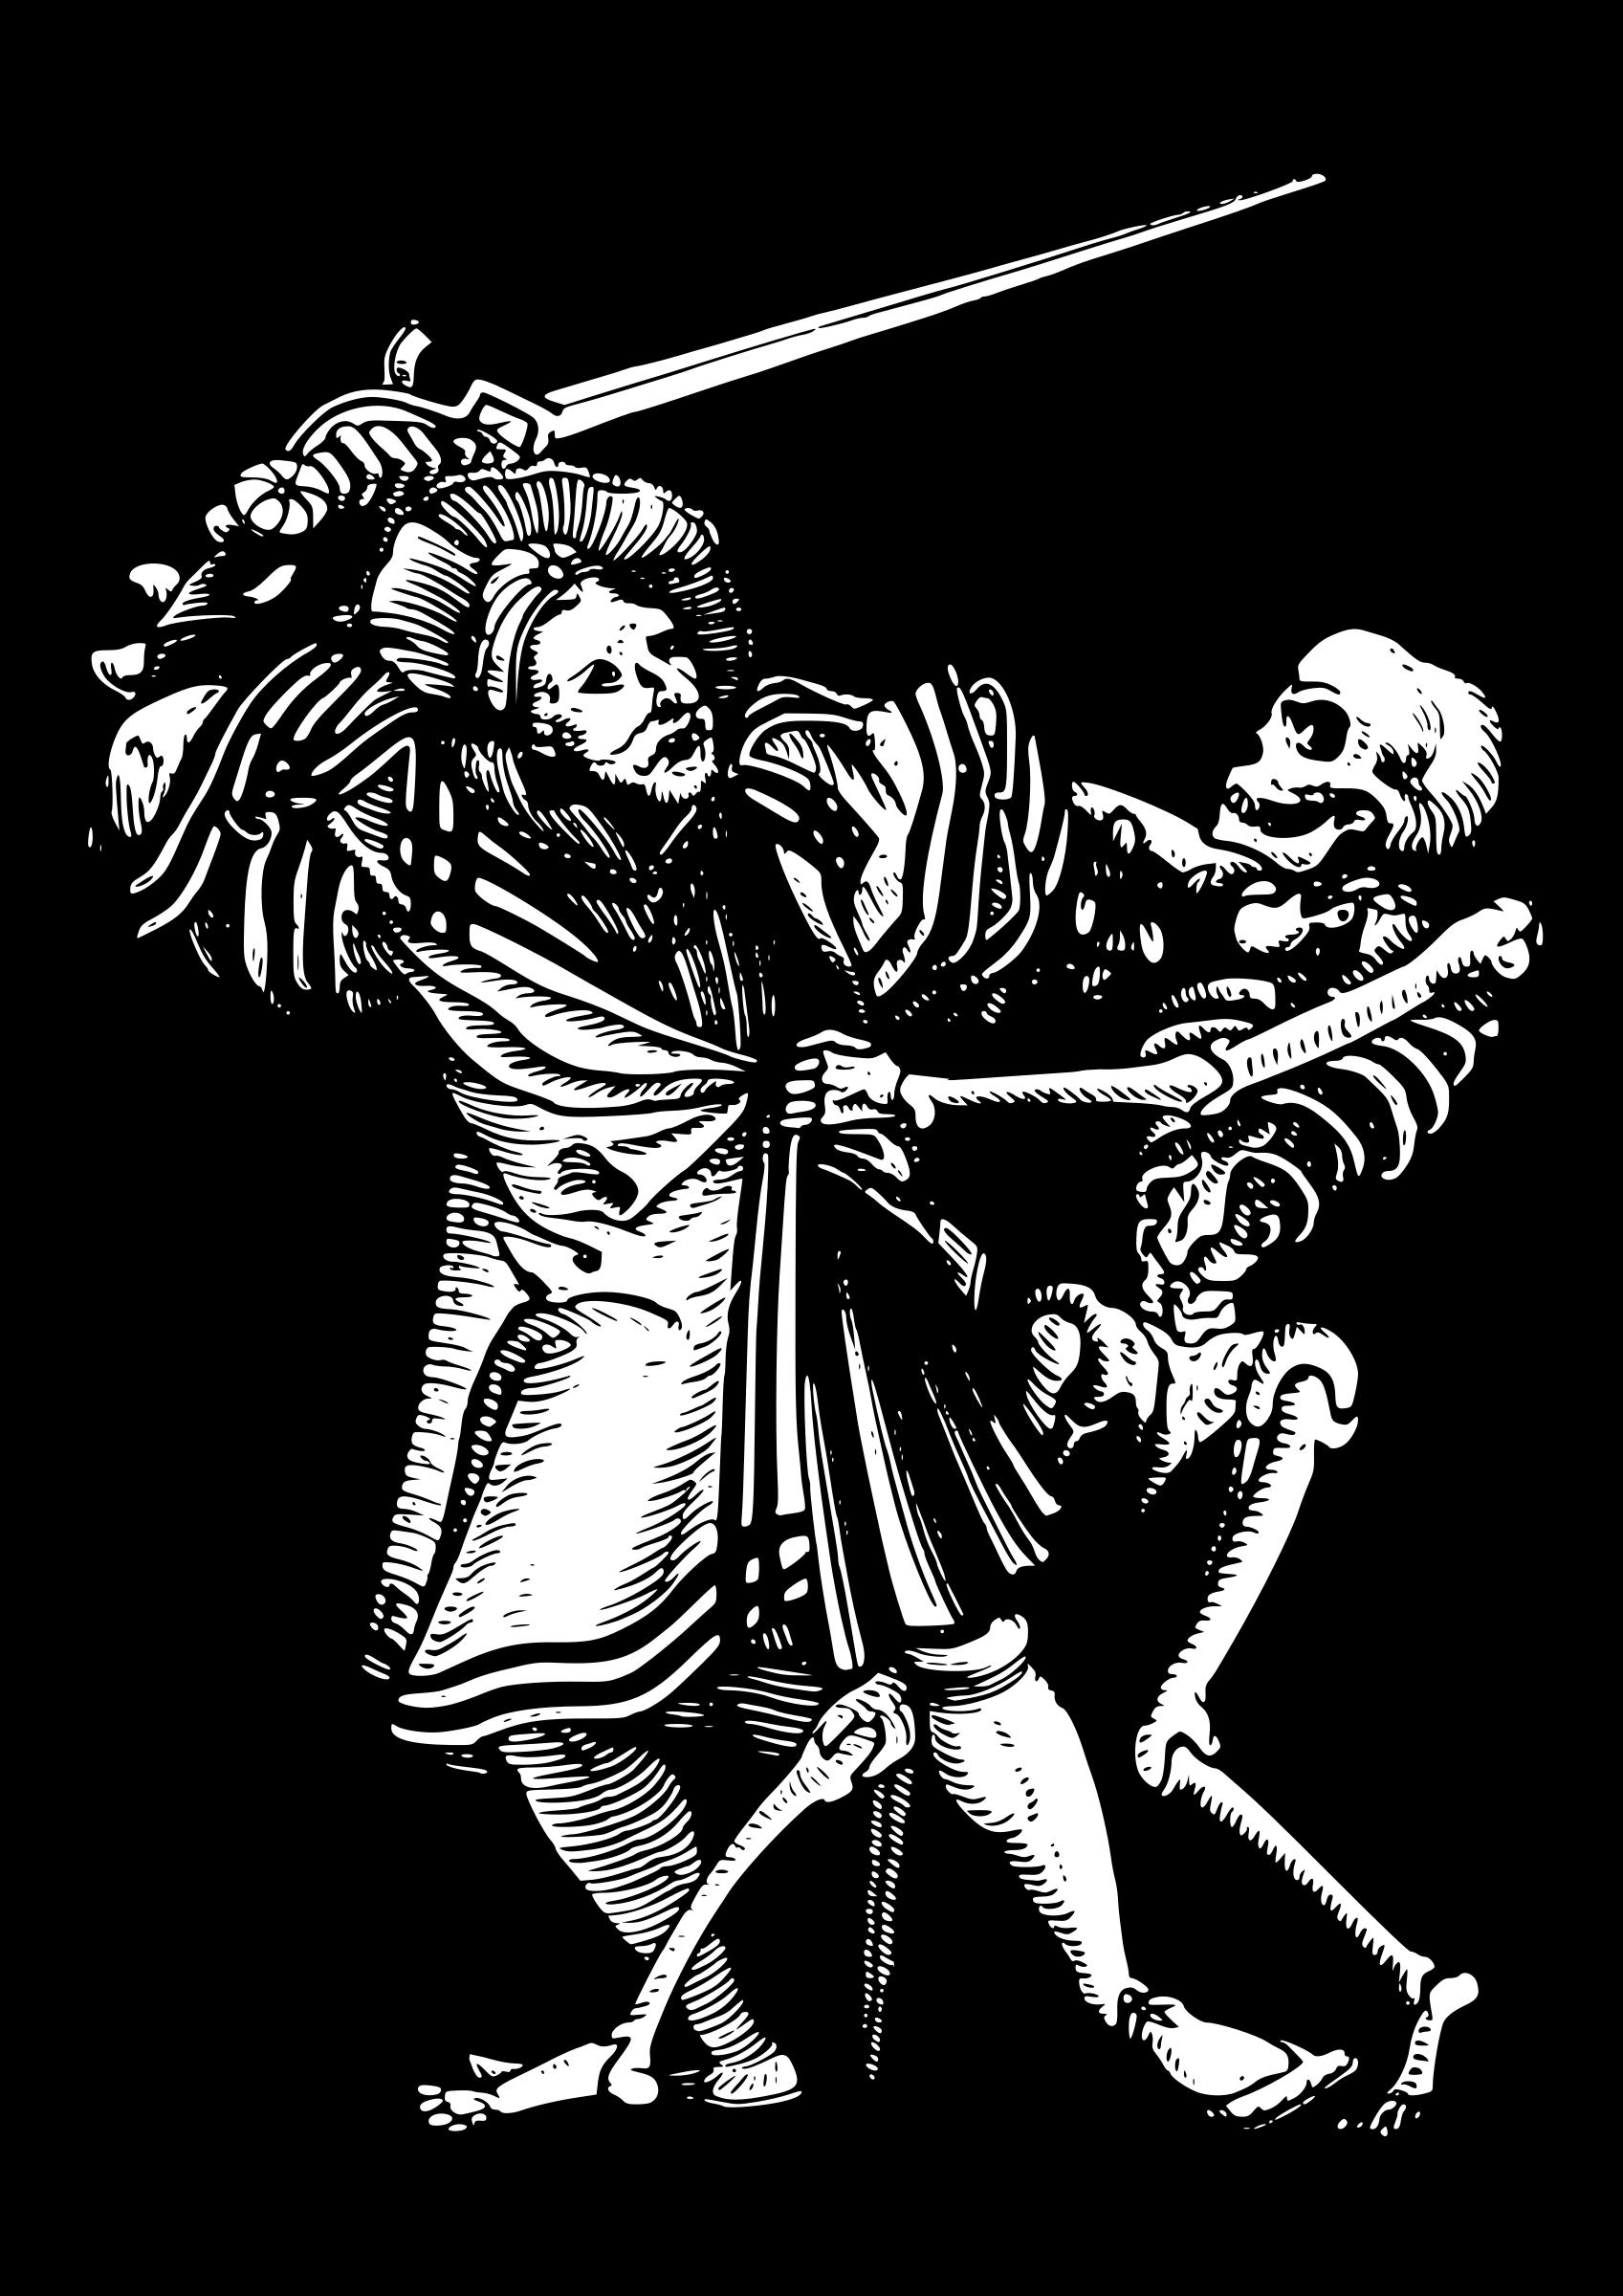 Fight clipart illustration. Man fighting death big